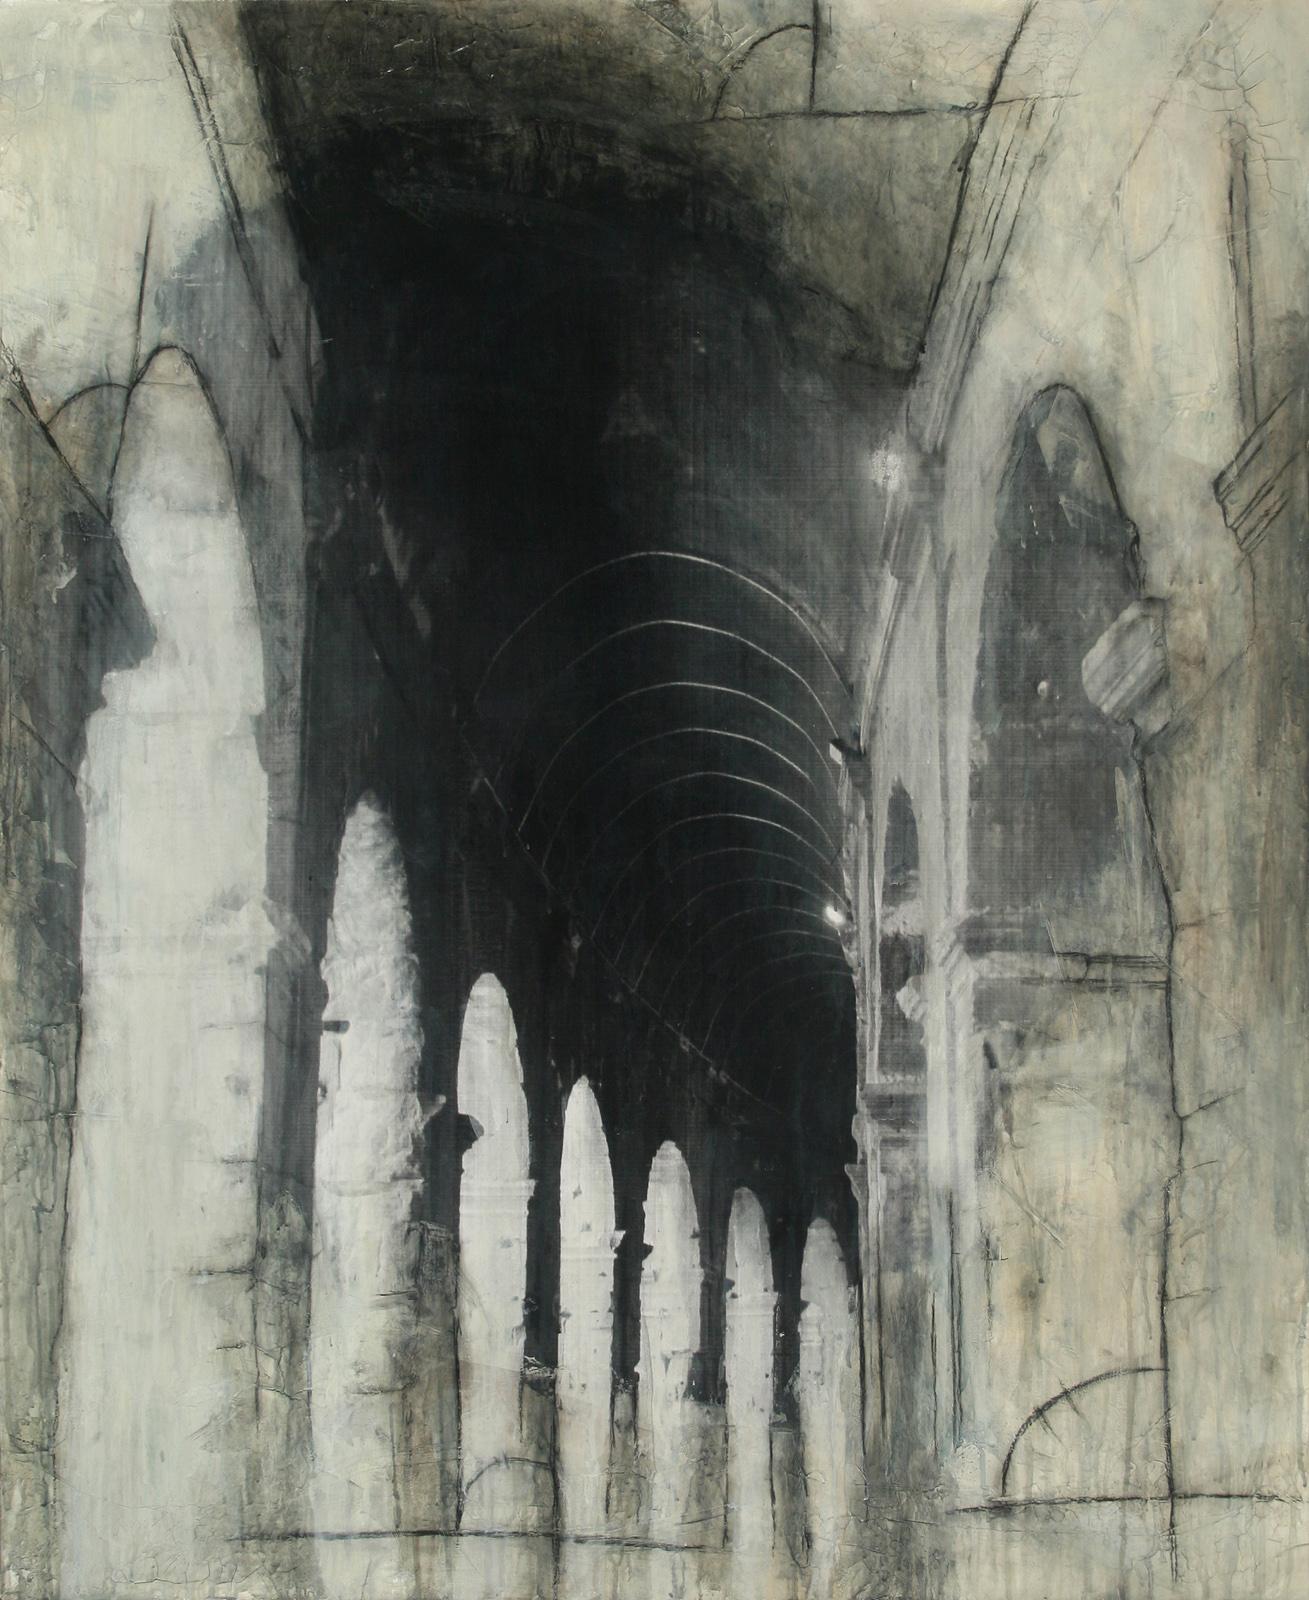 Colosseum Halls